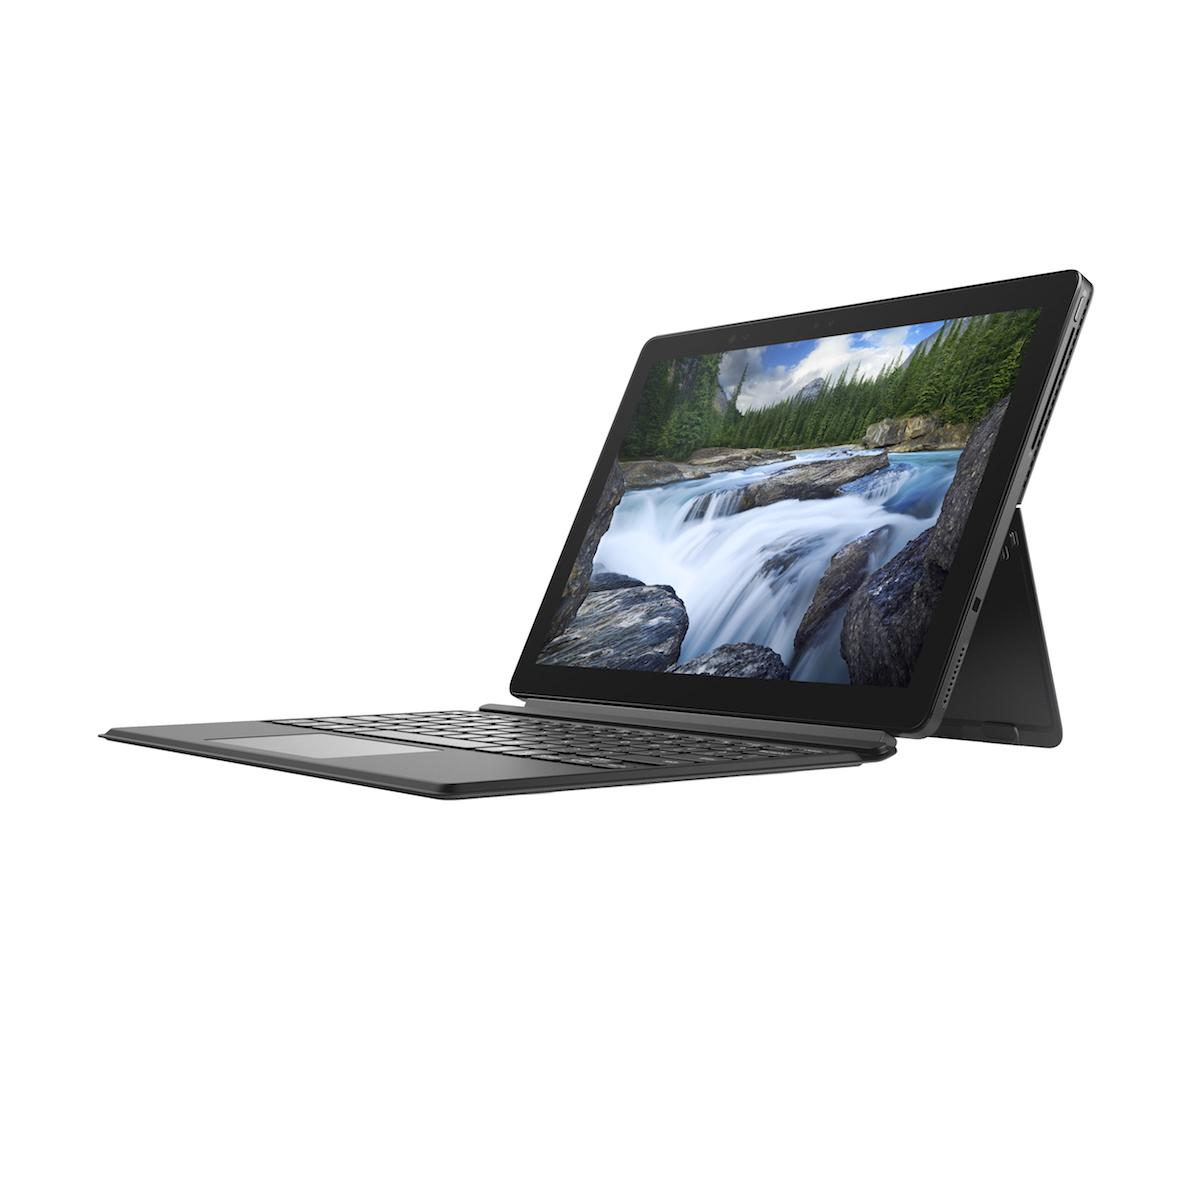 dell notebook notebooks laptops modelle preise carbon 4k display